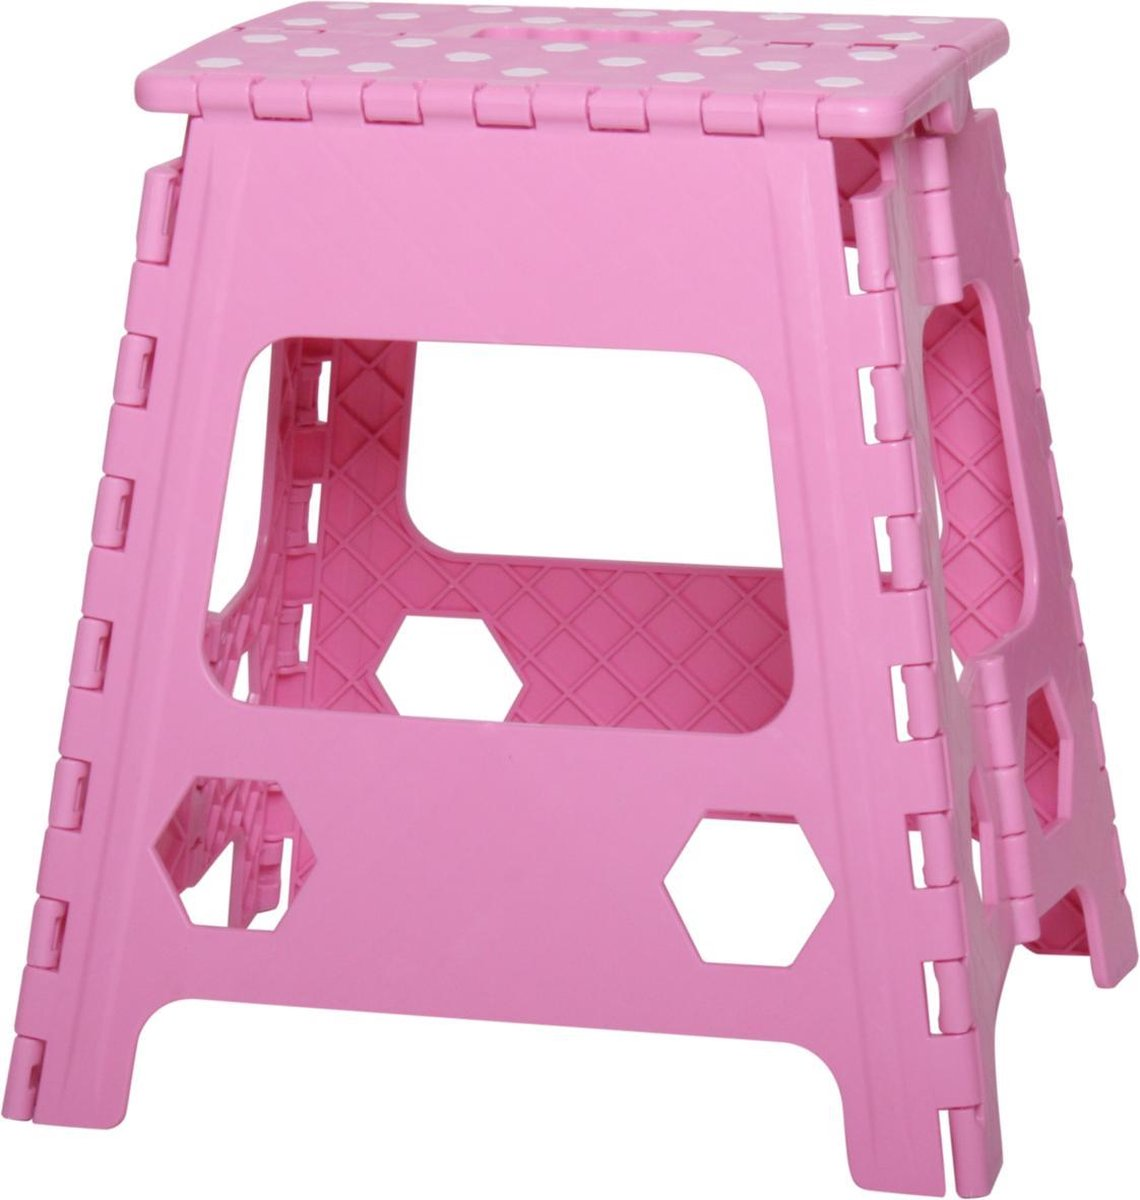 Qhp Opstapkrukje Step-up  - Pink